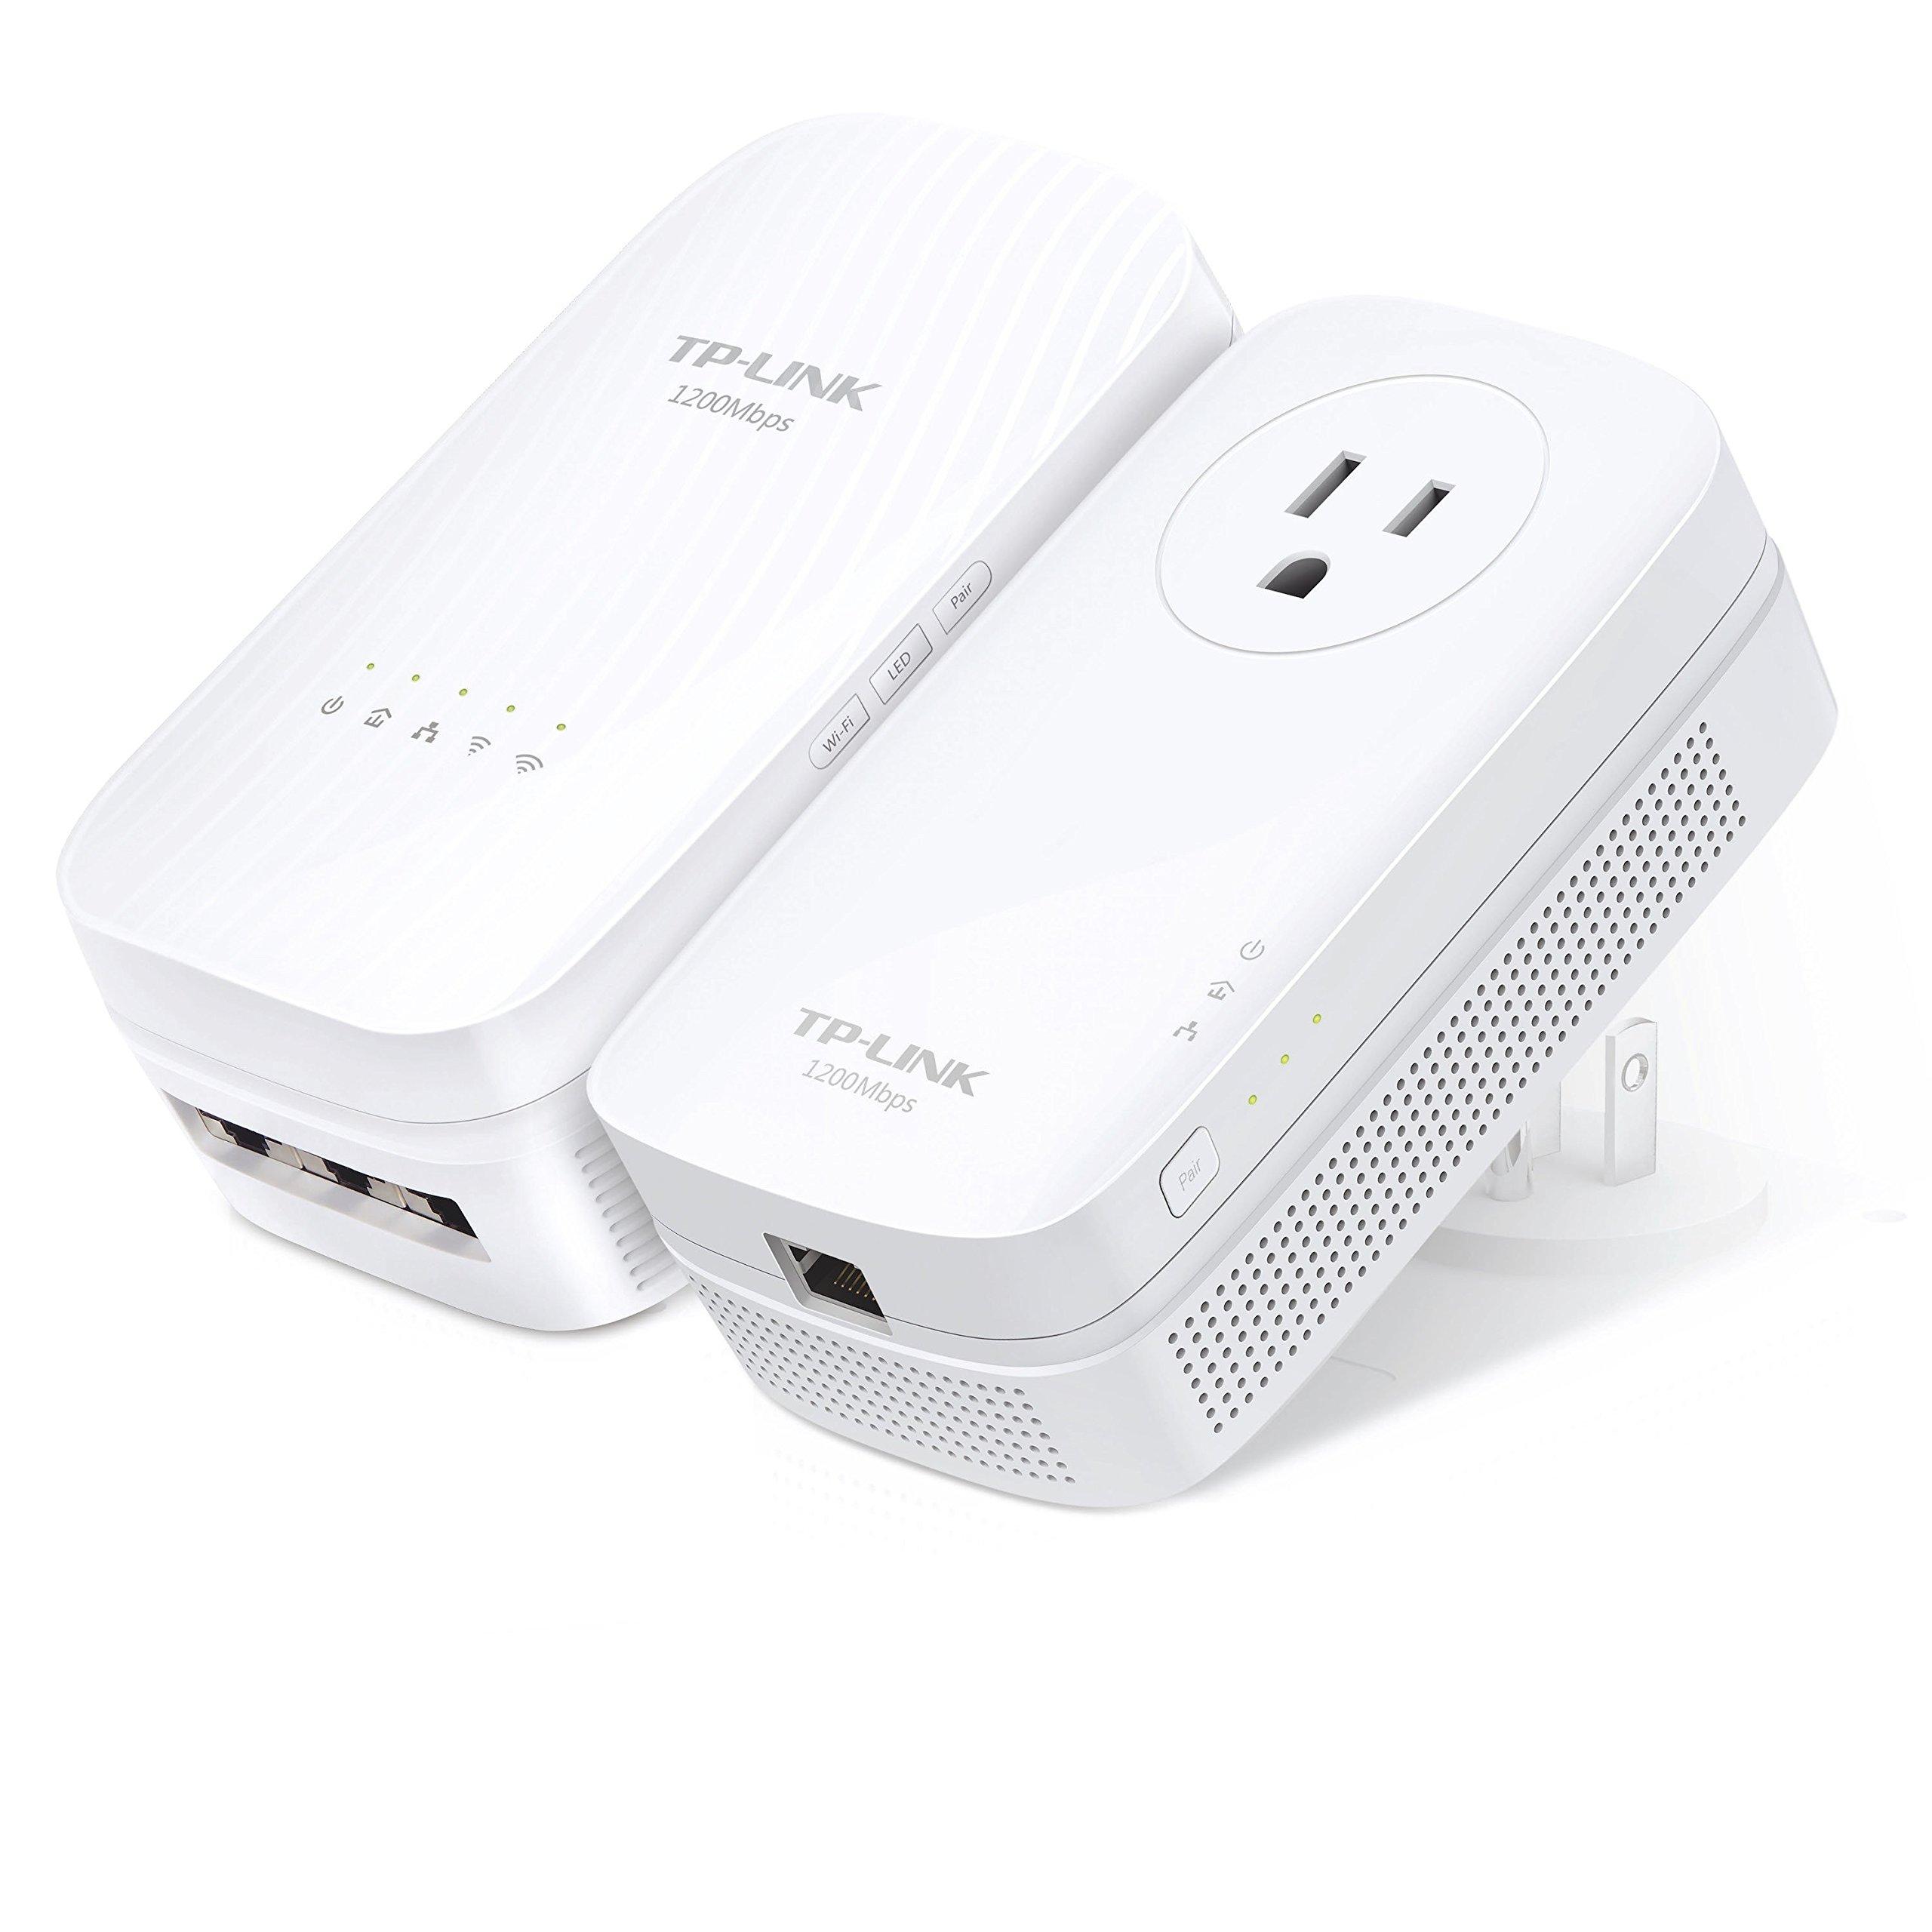 TP-LINK AC1750 Wi-Fi Range Extender, AV1200 Powerline Edition (TL-WPA8730 KIT) by TP-Link